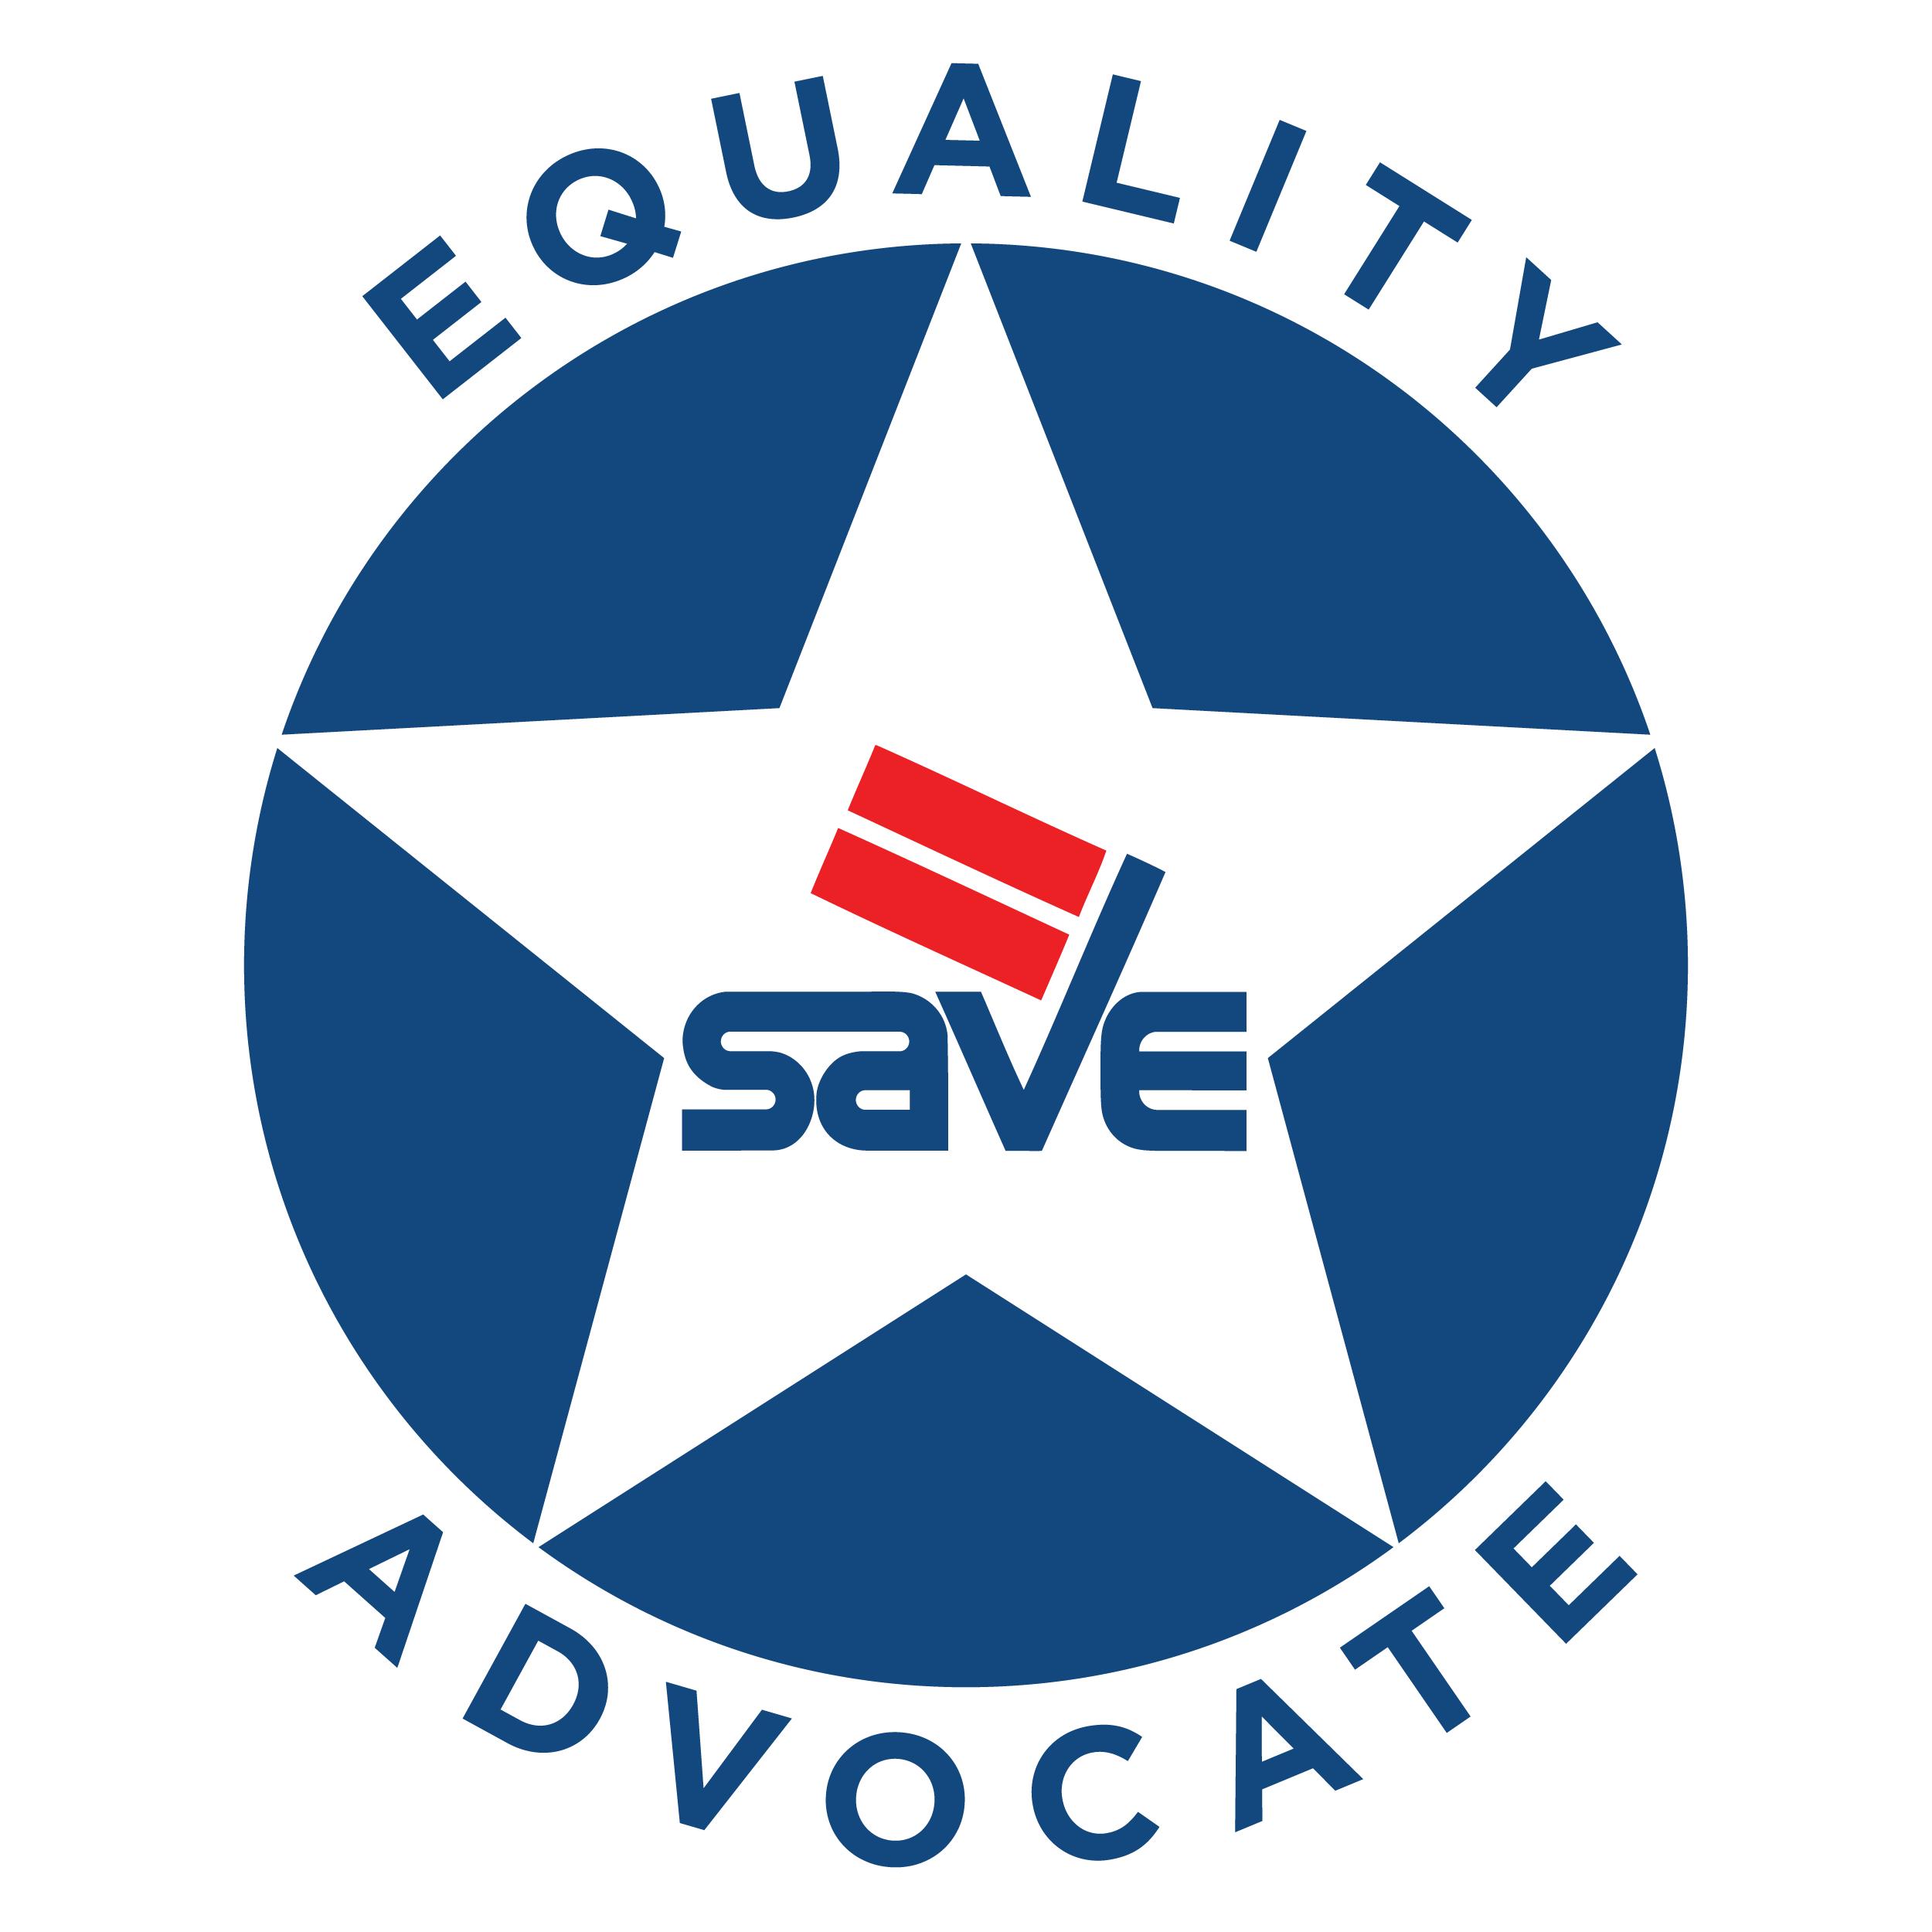 advocate_circle.png